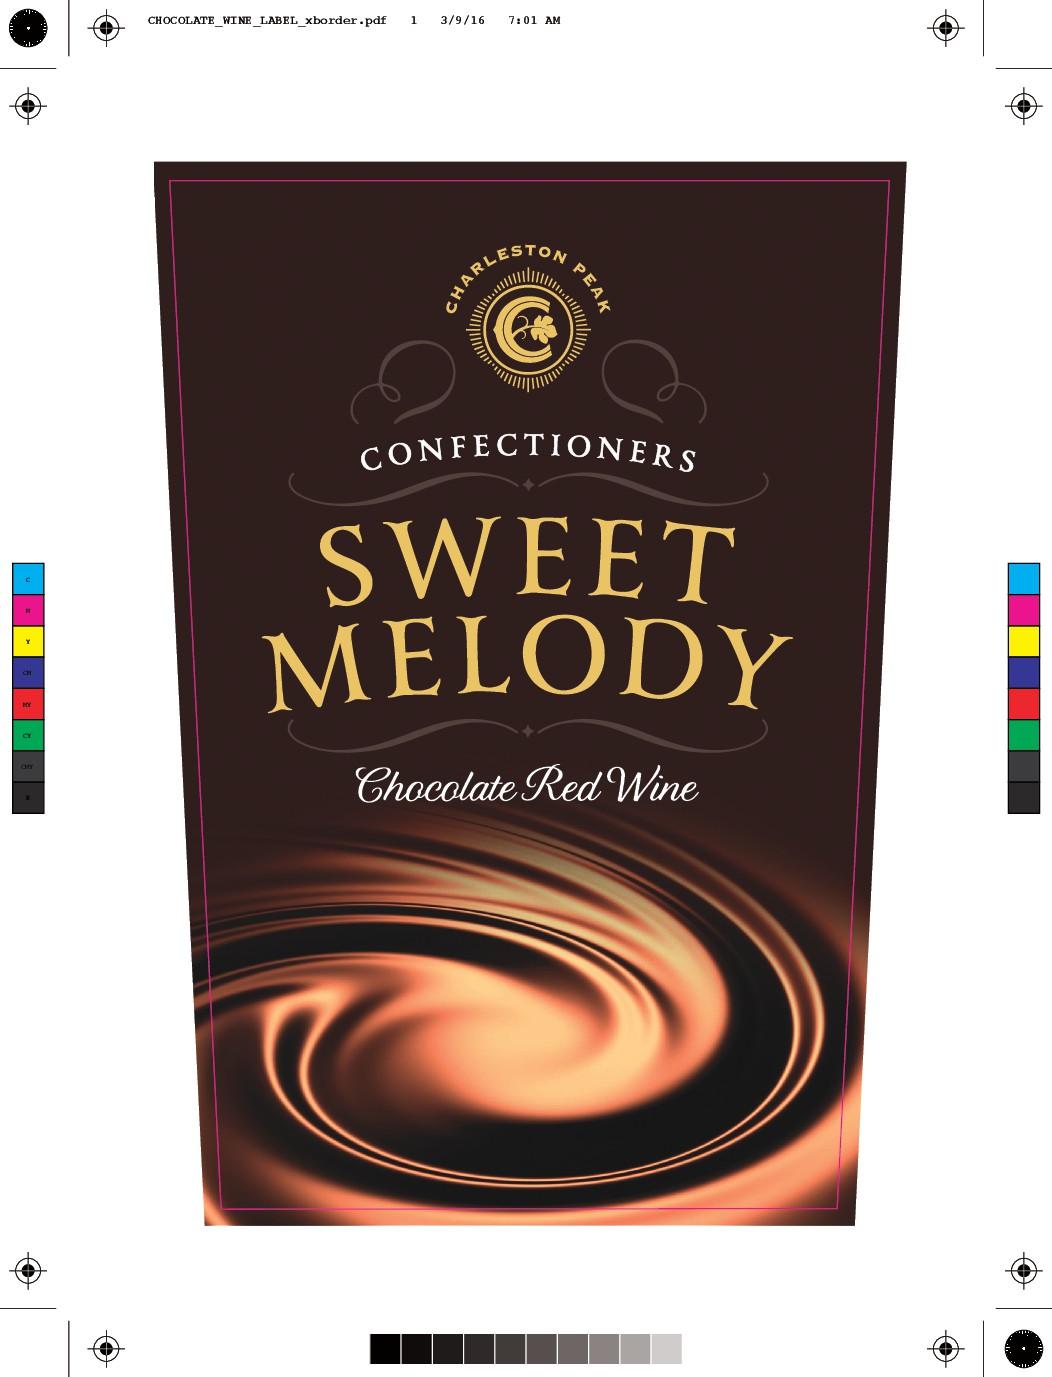 Chocolate wine label